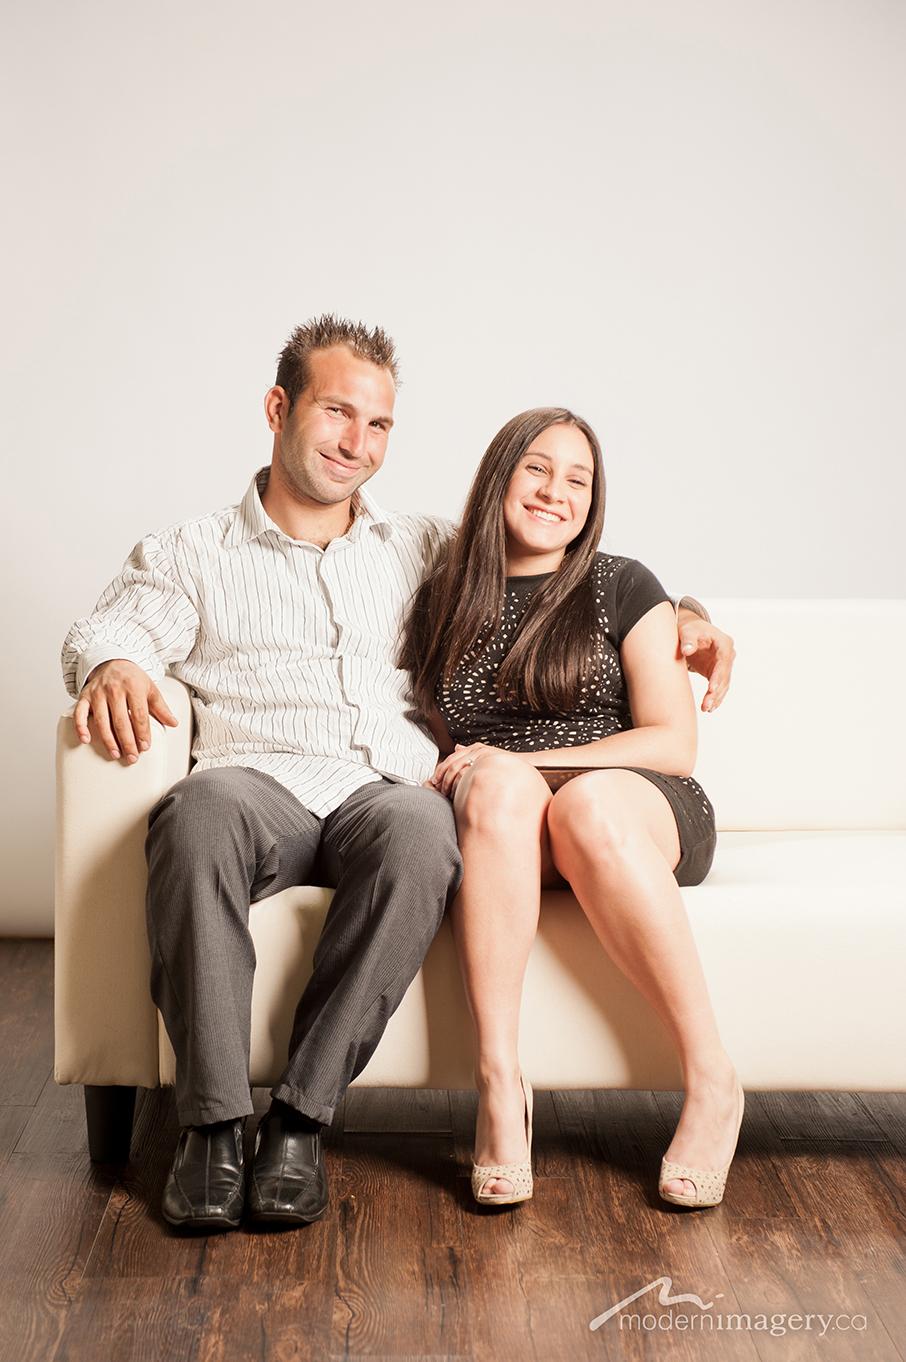 Rita&Tomasso-3.jpg